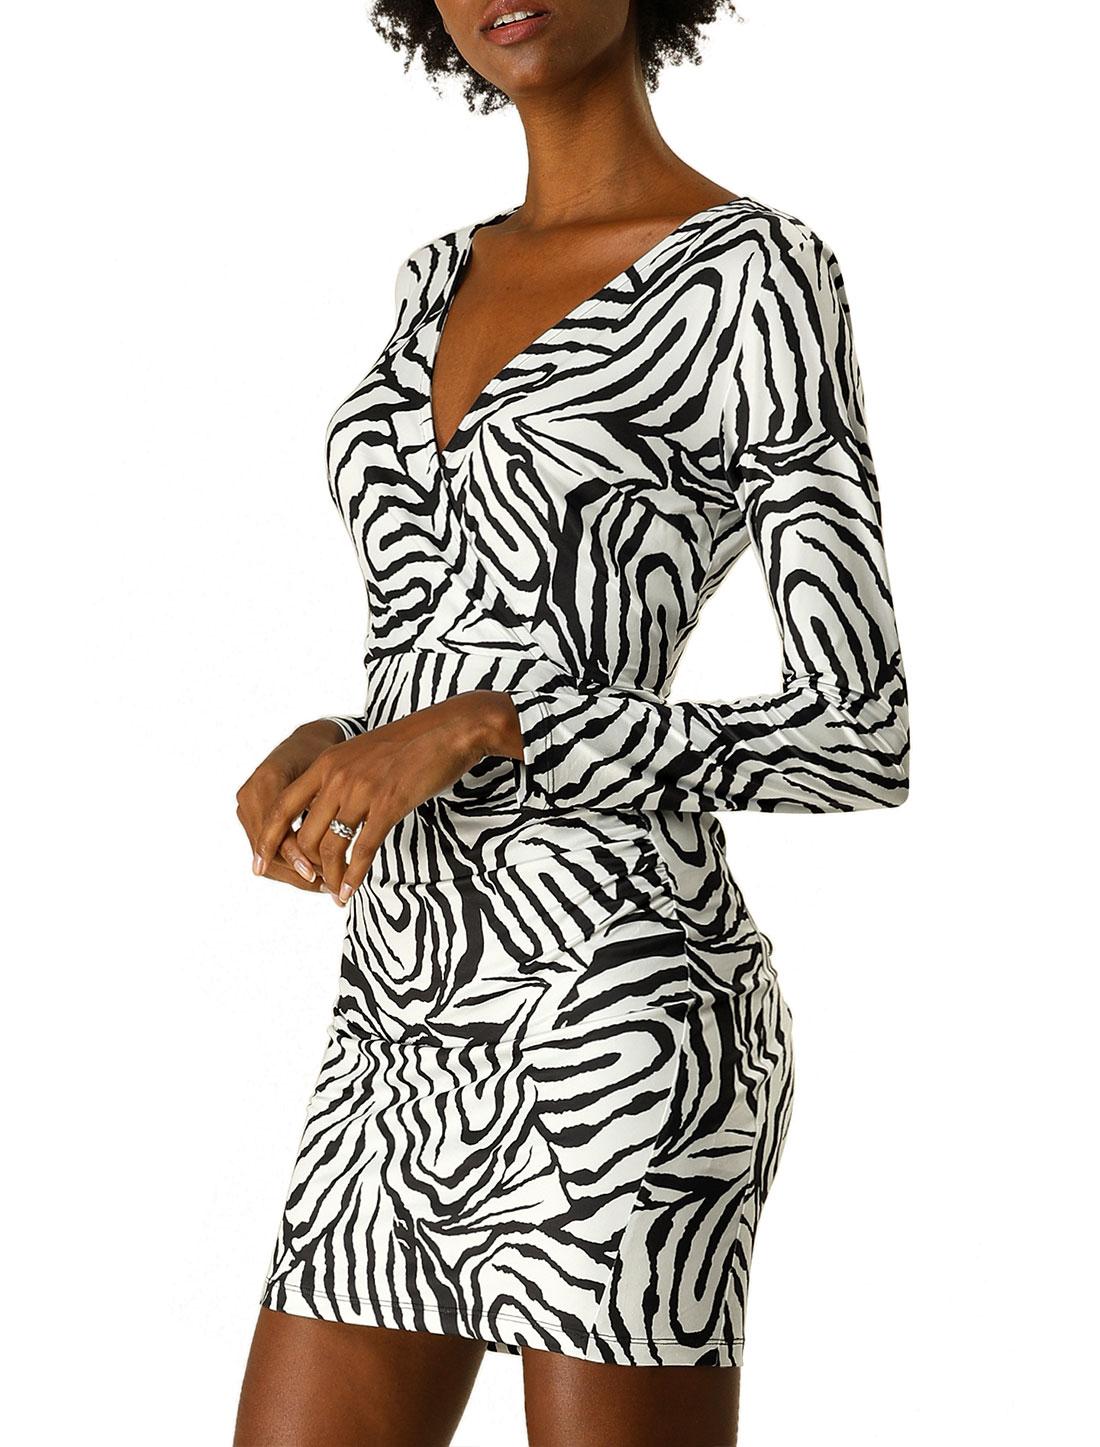 Allegra K Women's Sexy Long Sleeve Stretchy Bodycon Mini Dress Black S